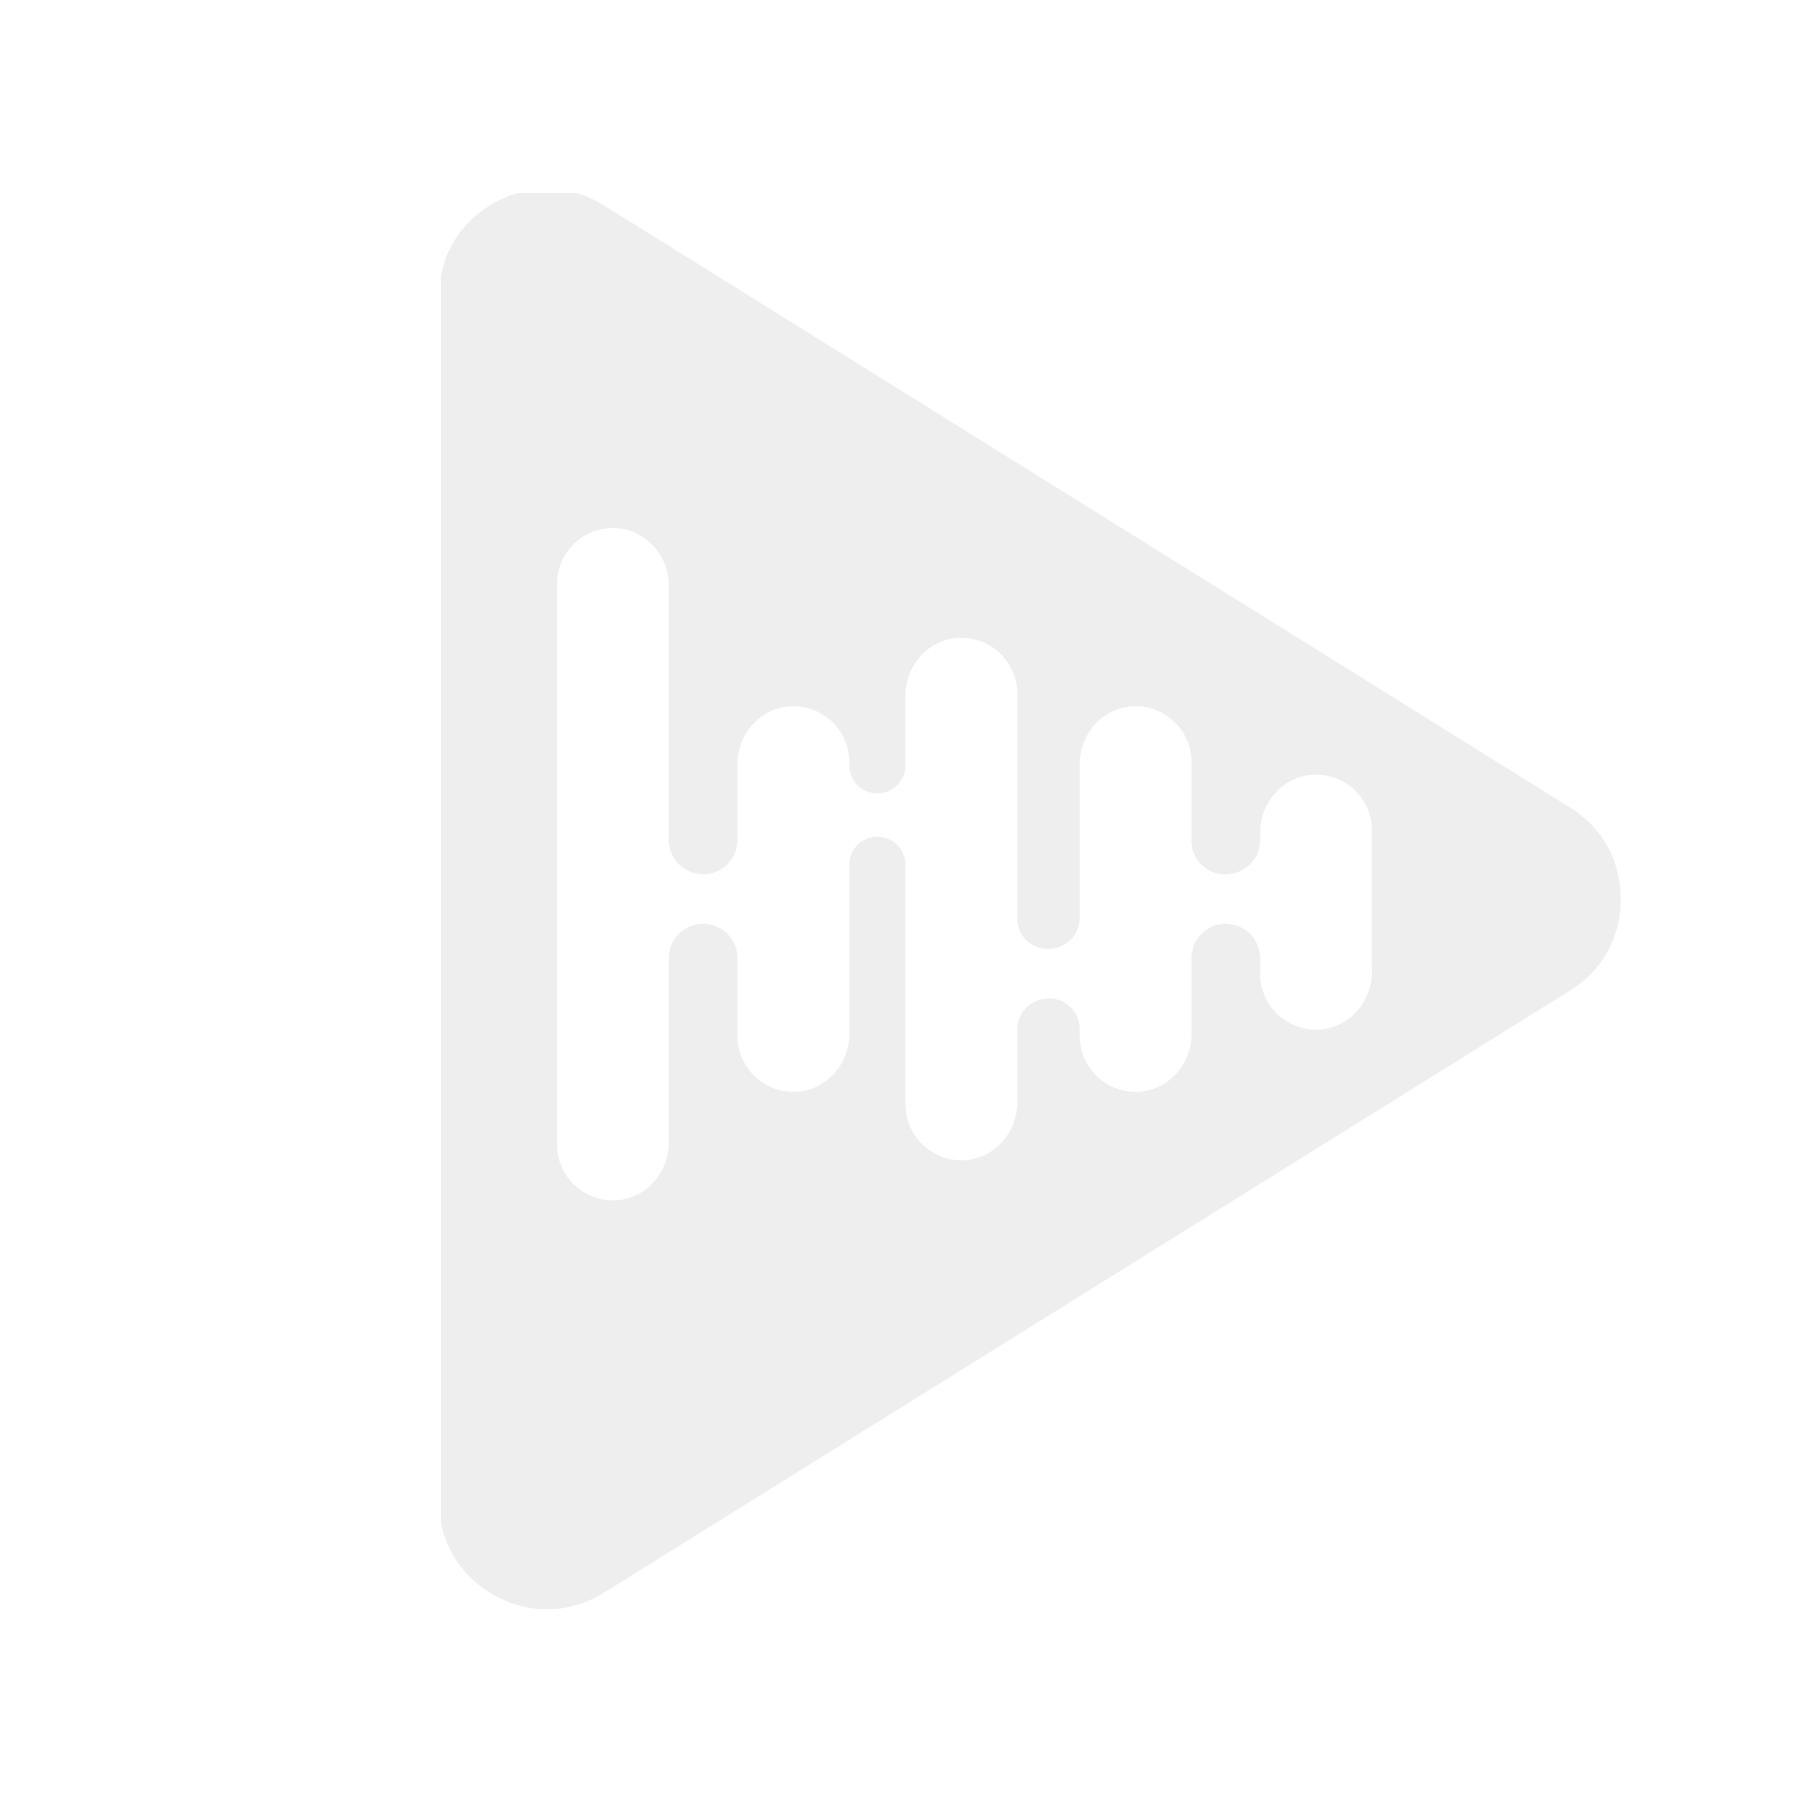 Grandview 148634 - Lerret Cyber, 16:9, 234x132, Manuelt 106